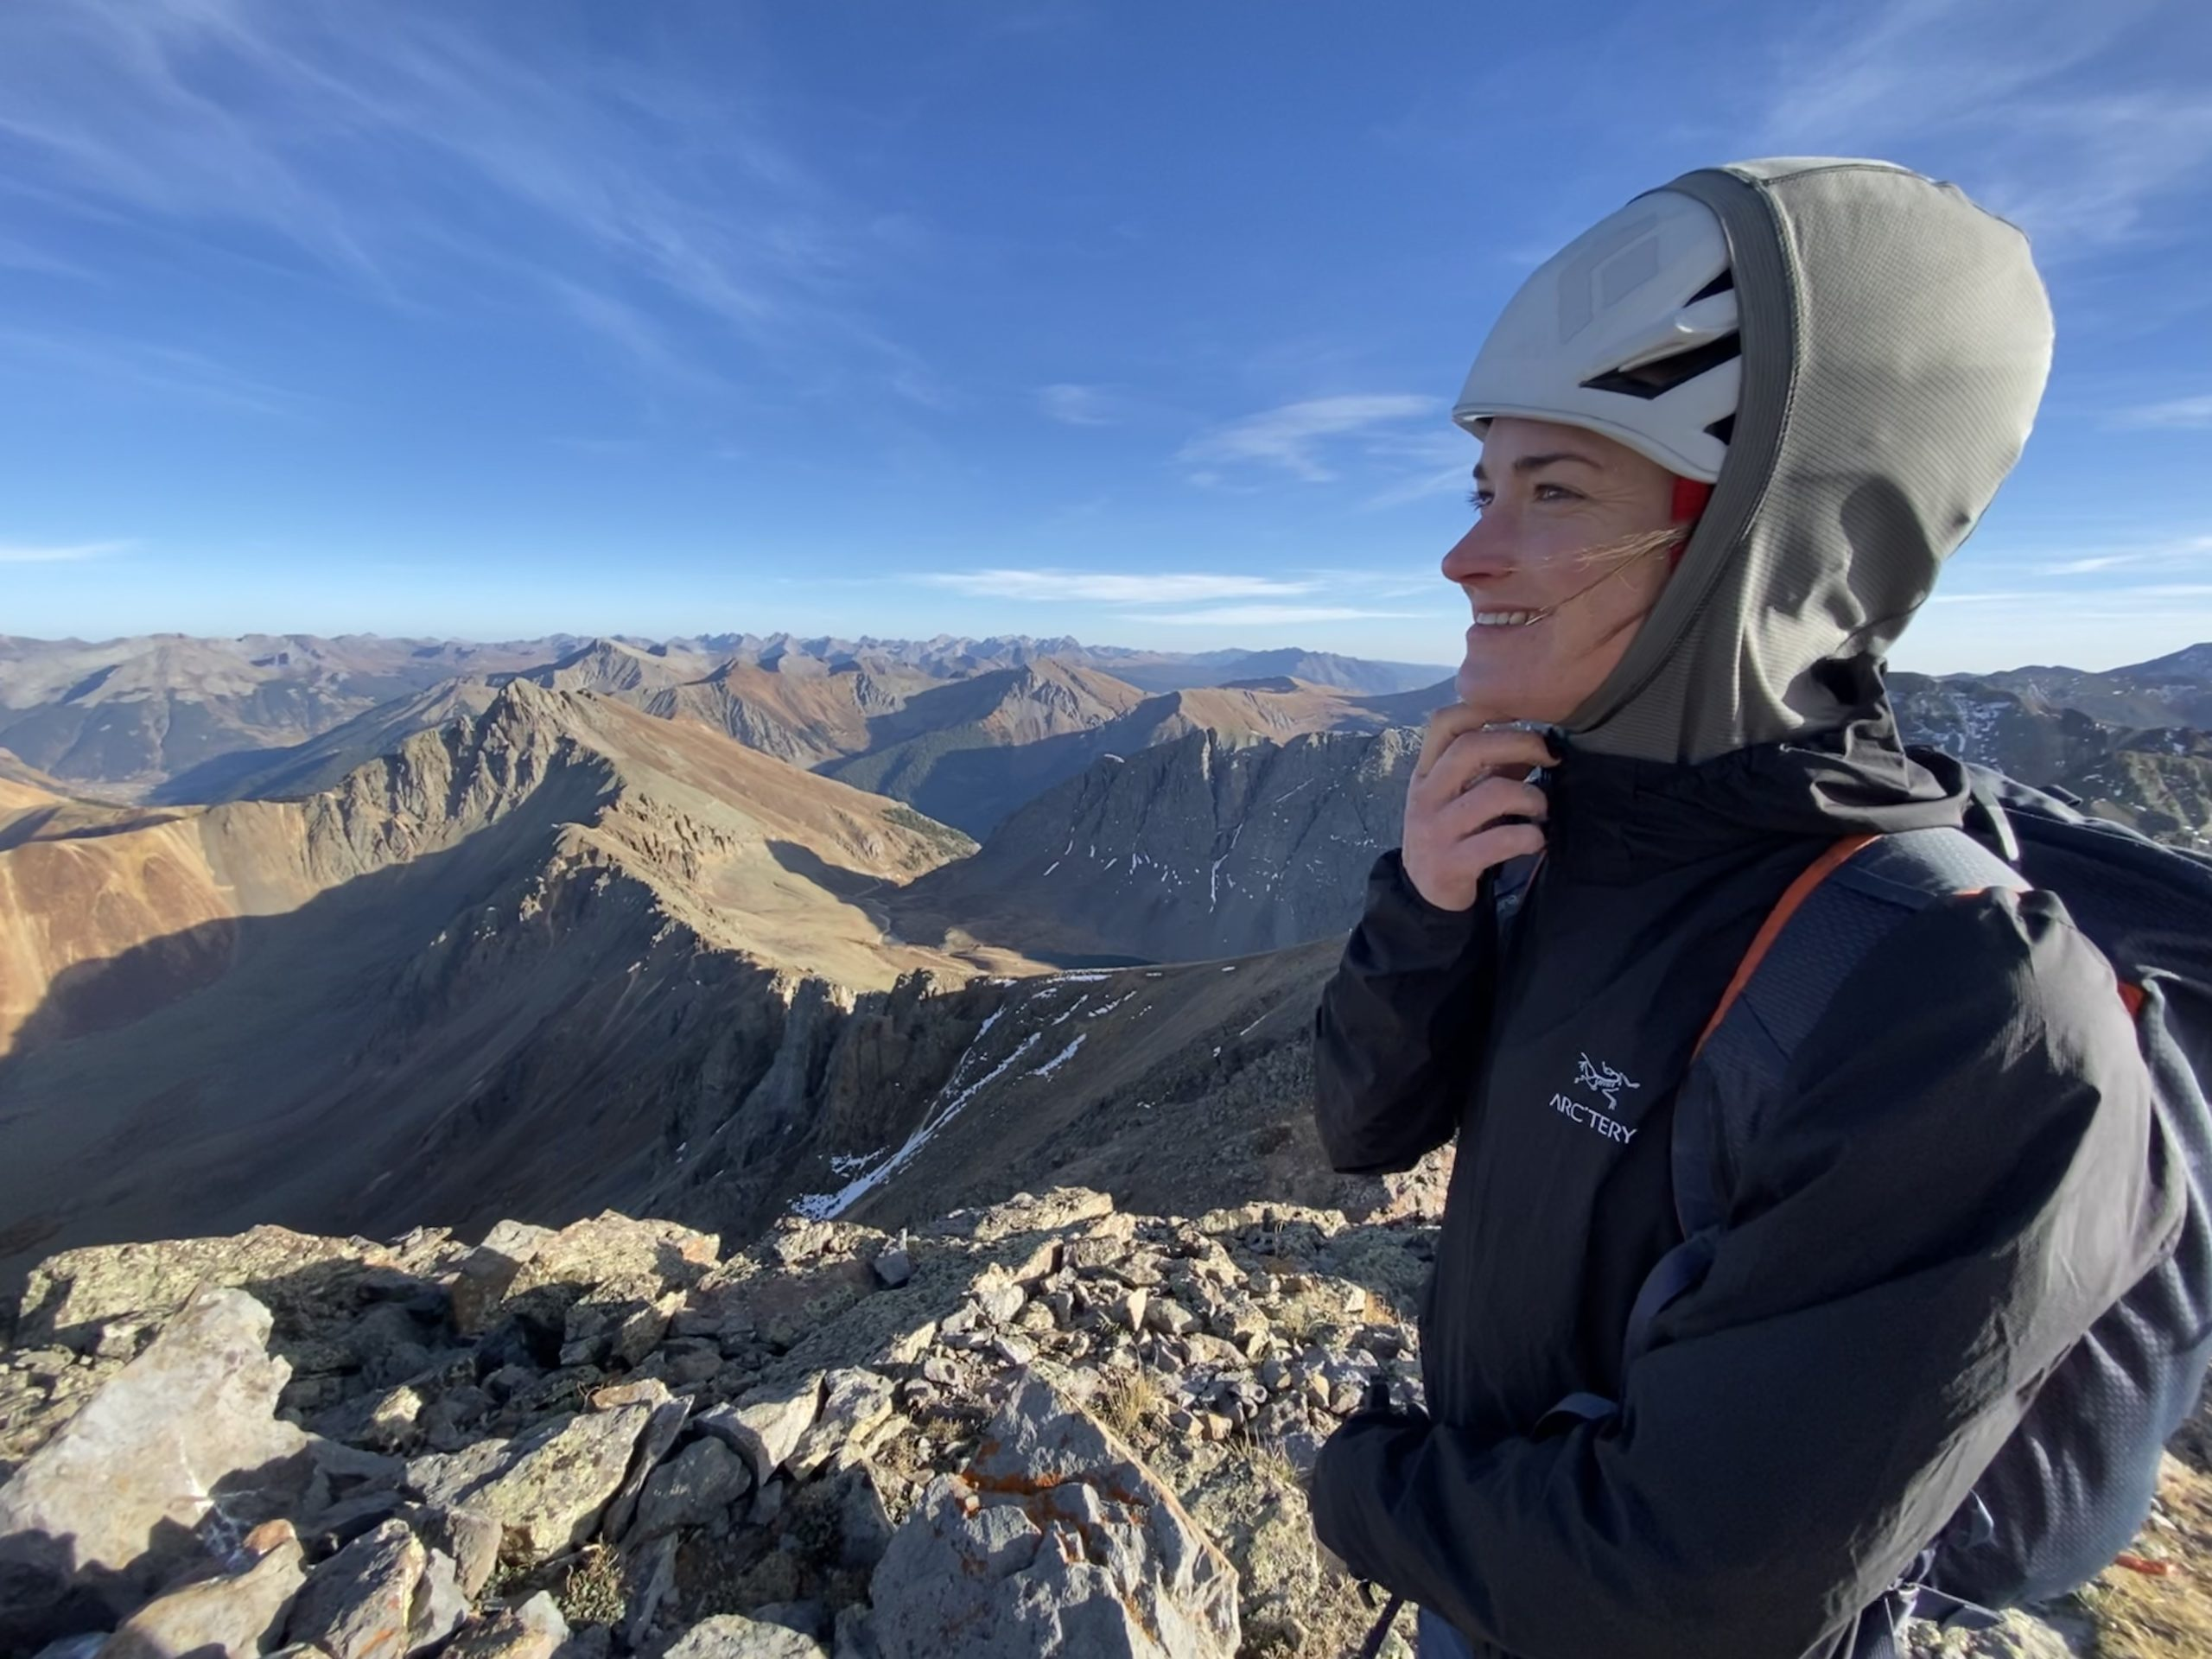 south lookout peak 13er silverton colorado